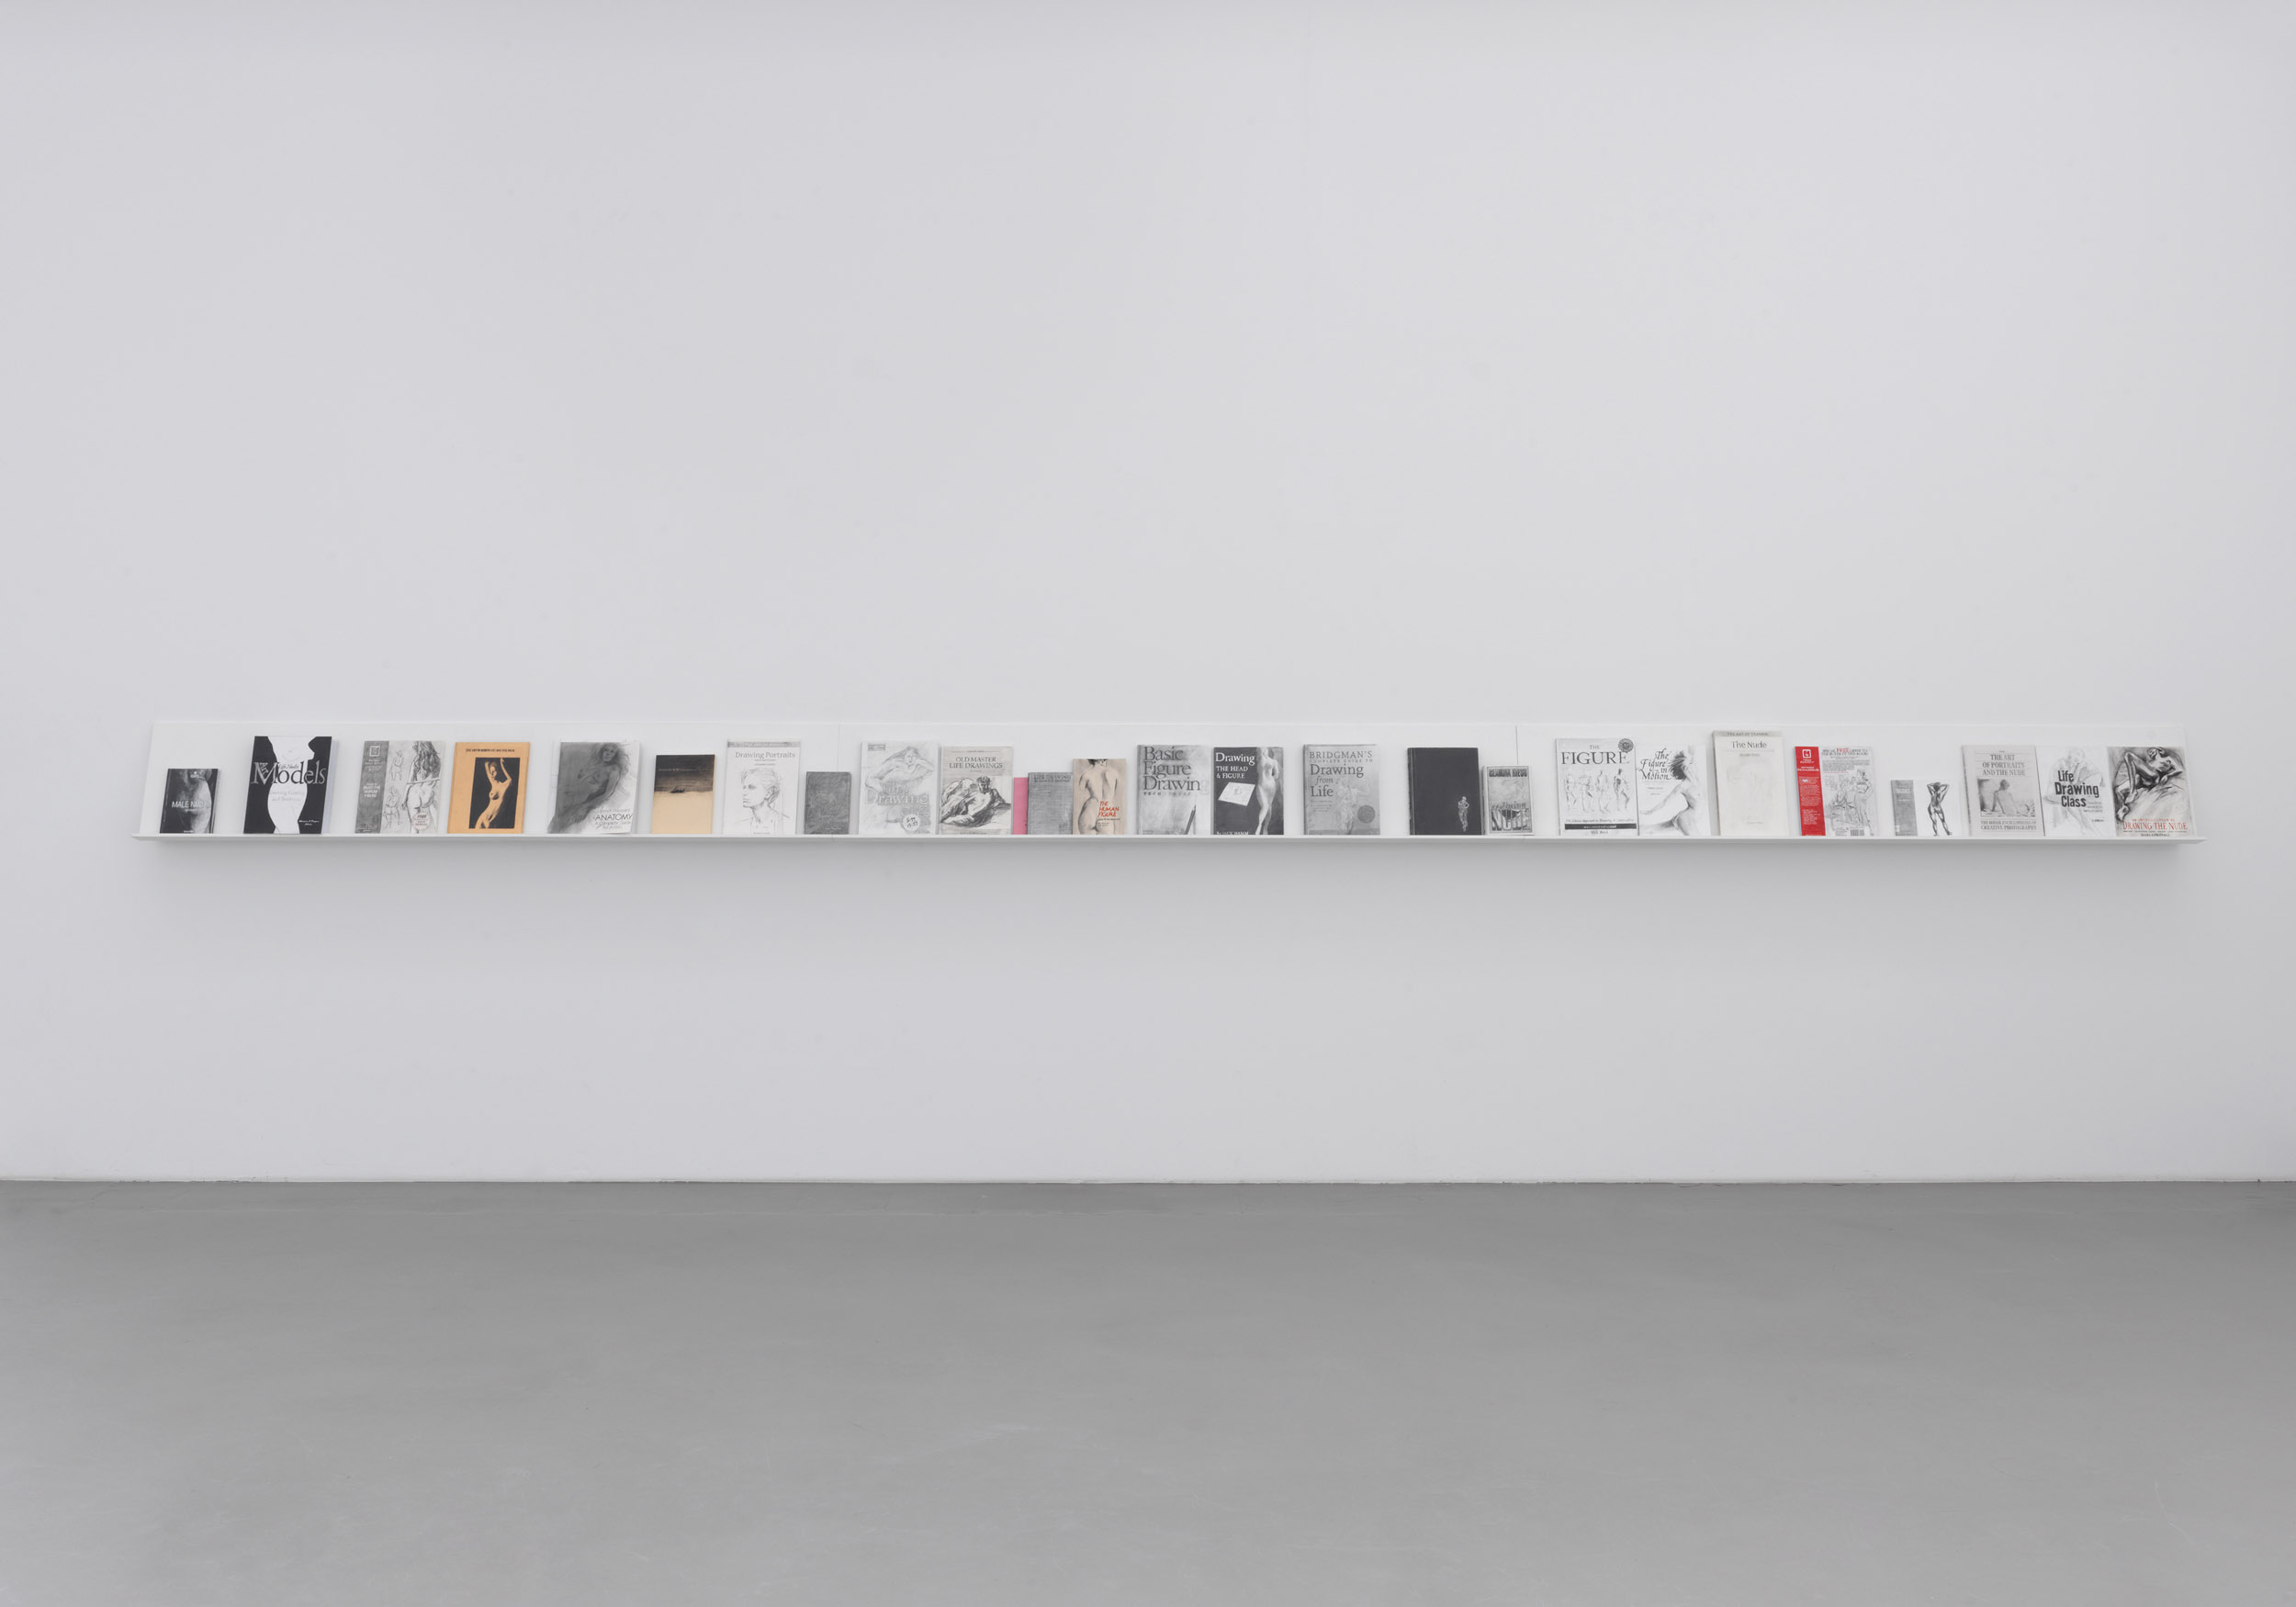 Galerie Barbara Thumm \ Fiona Banner aka The Vanity Press – Snoopy vs The Red Baron